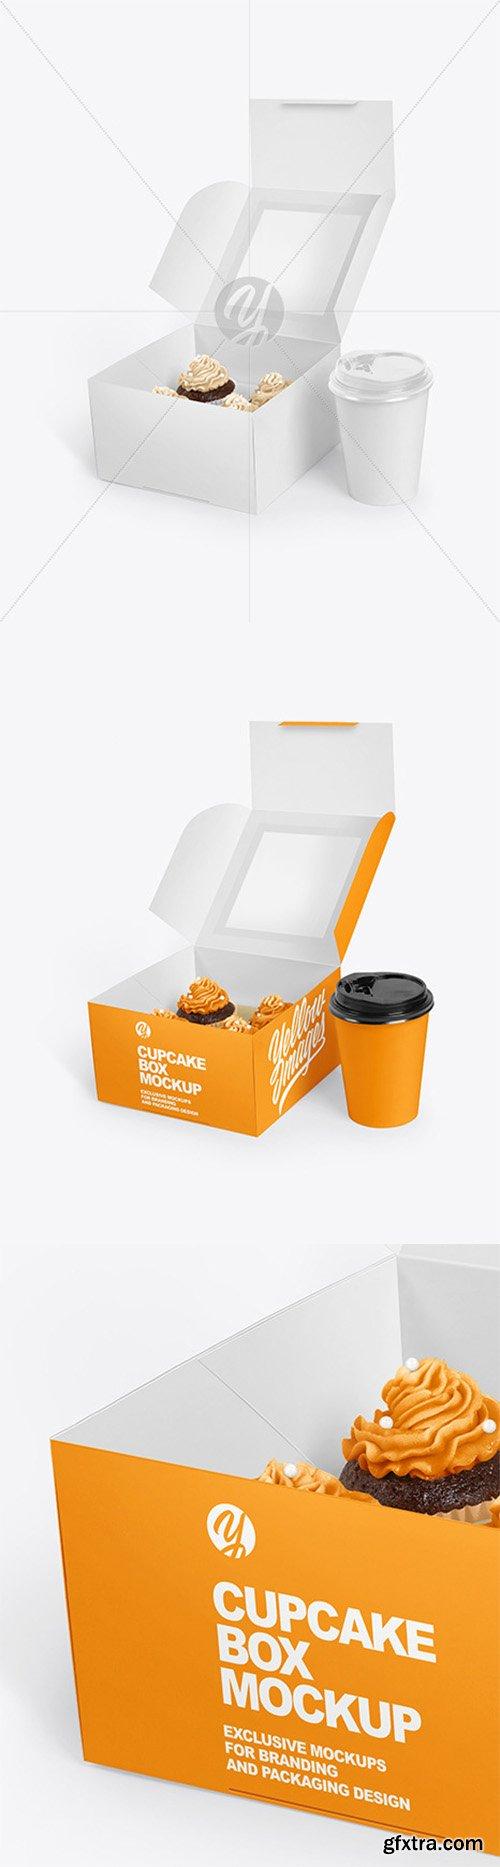 Box w/ Cupcake Mockup 66131